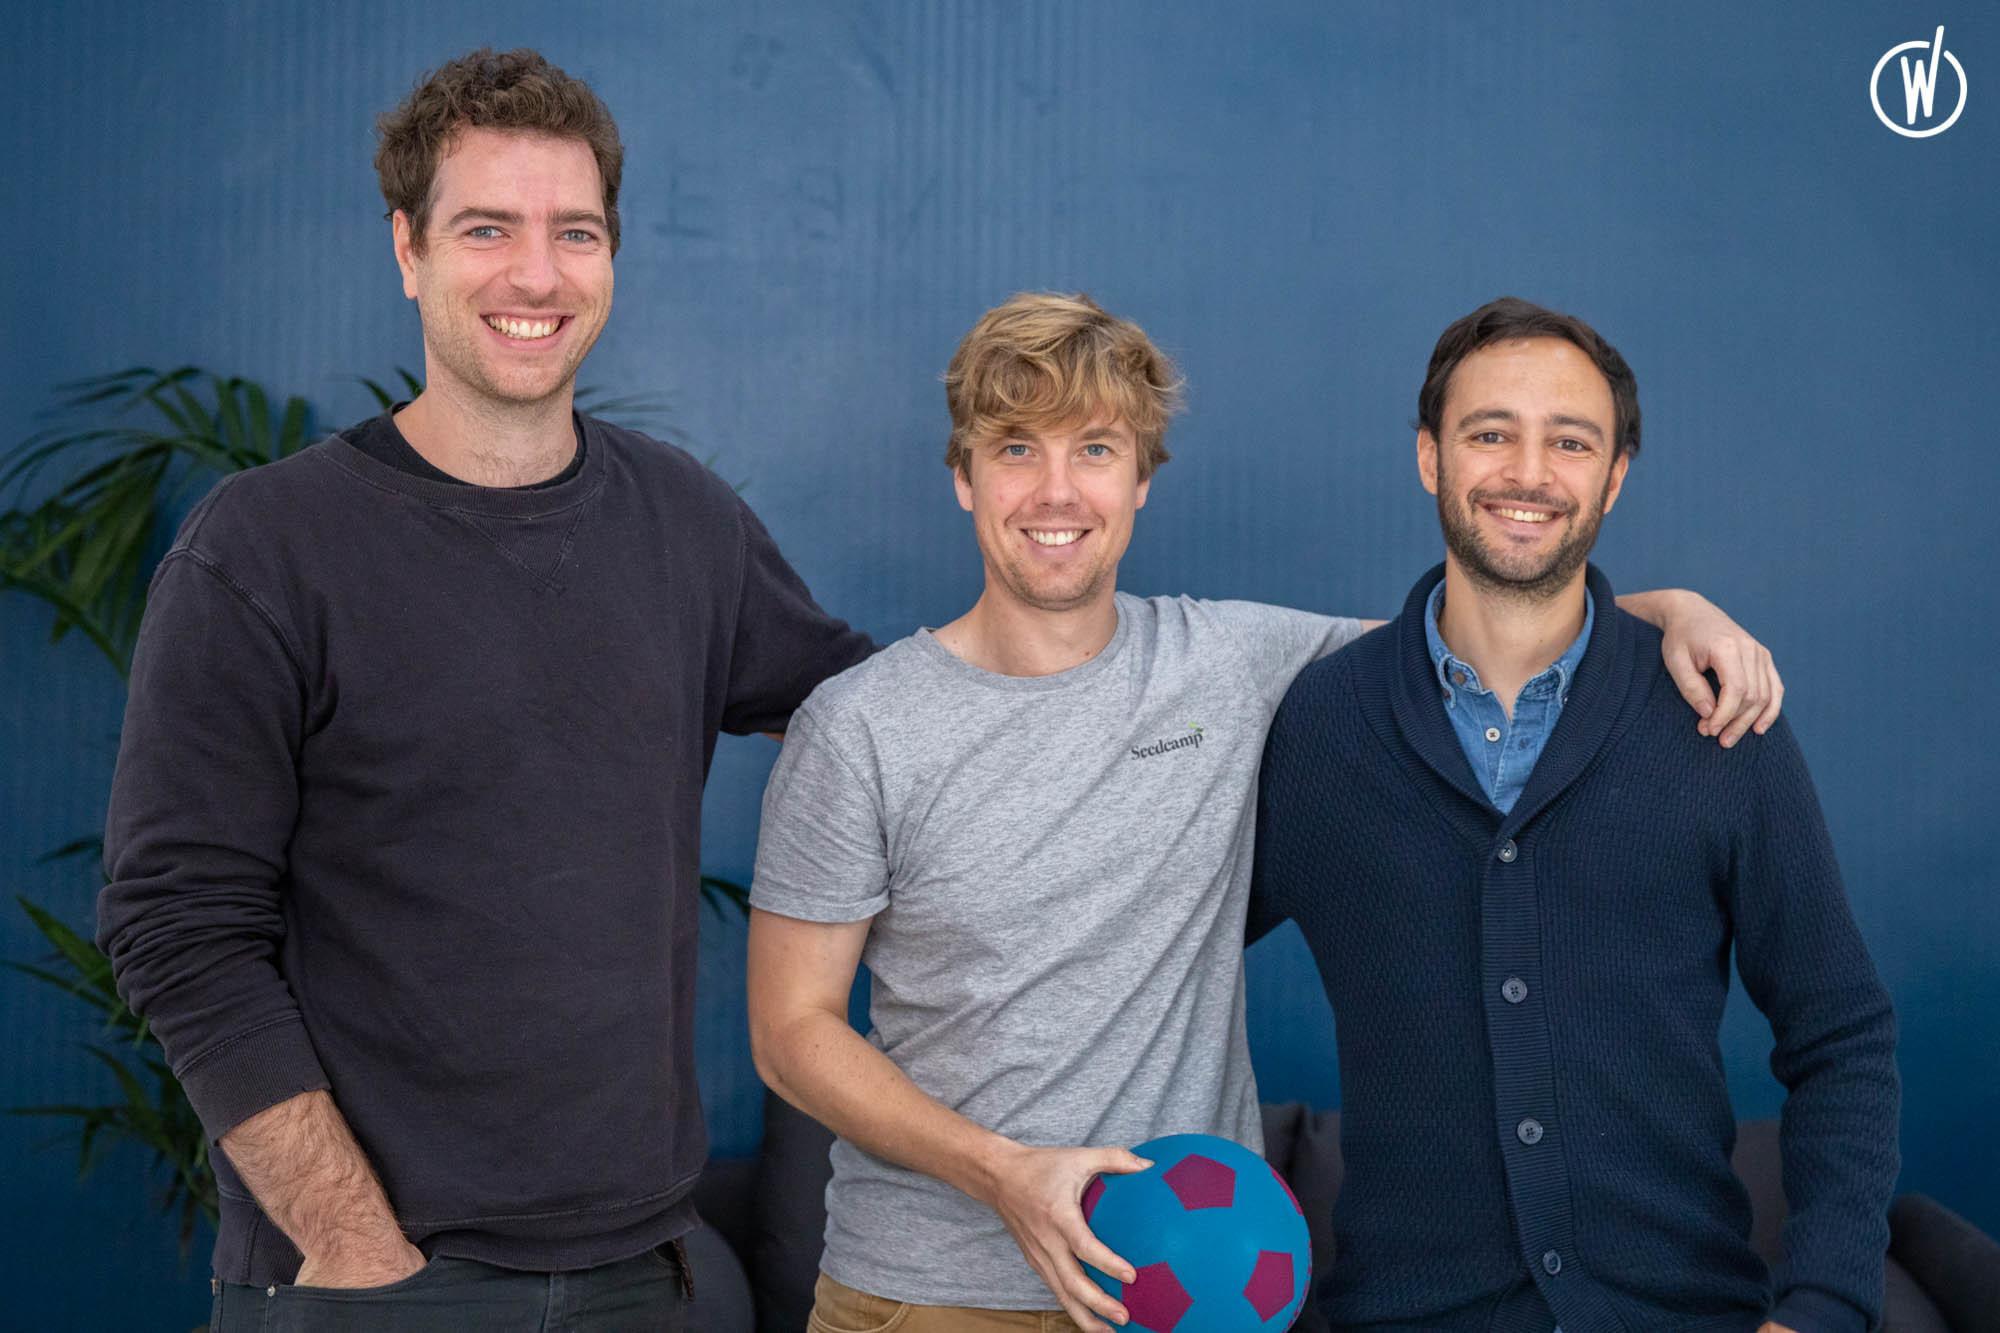 Founding team of Sorare